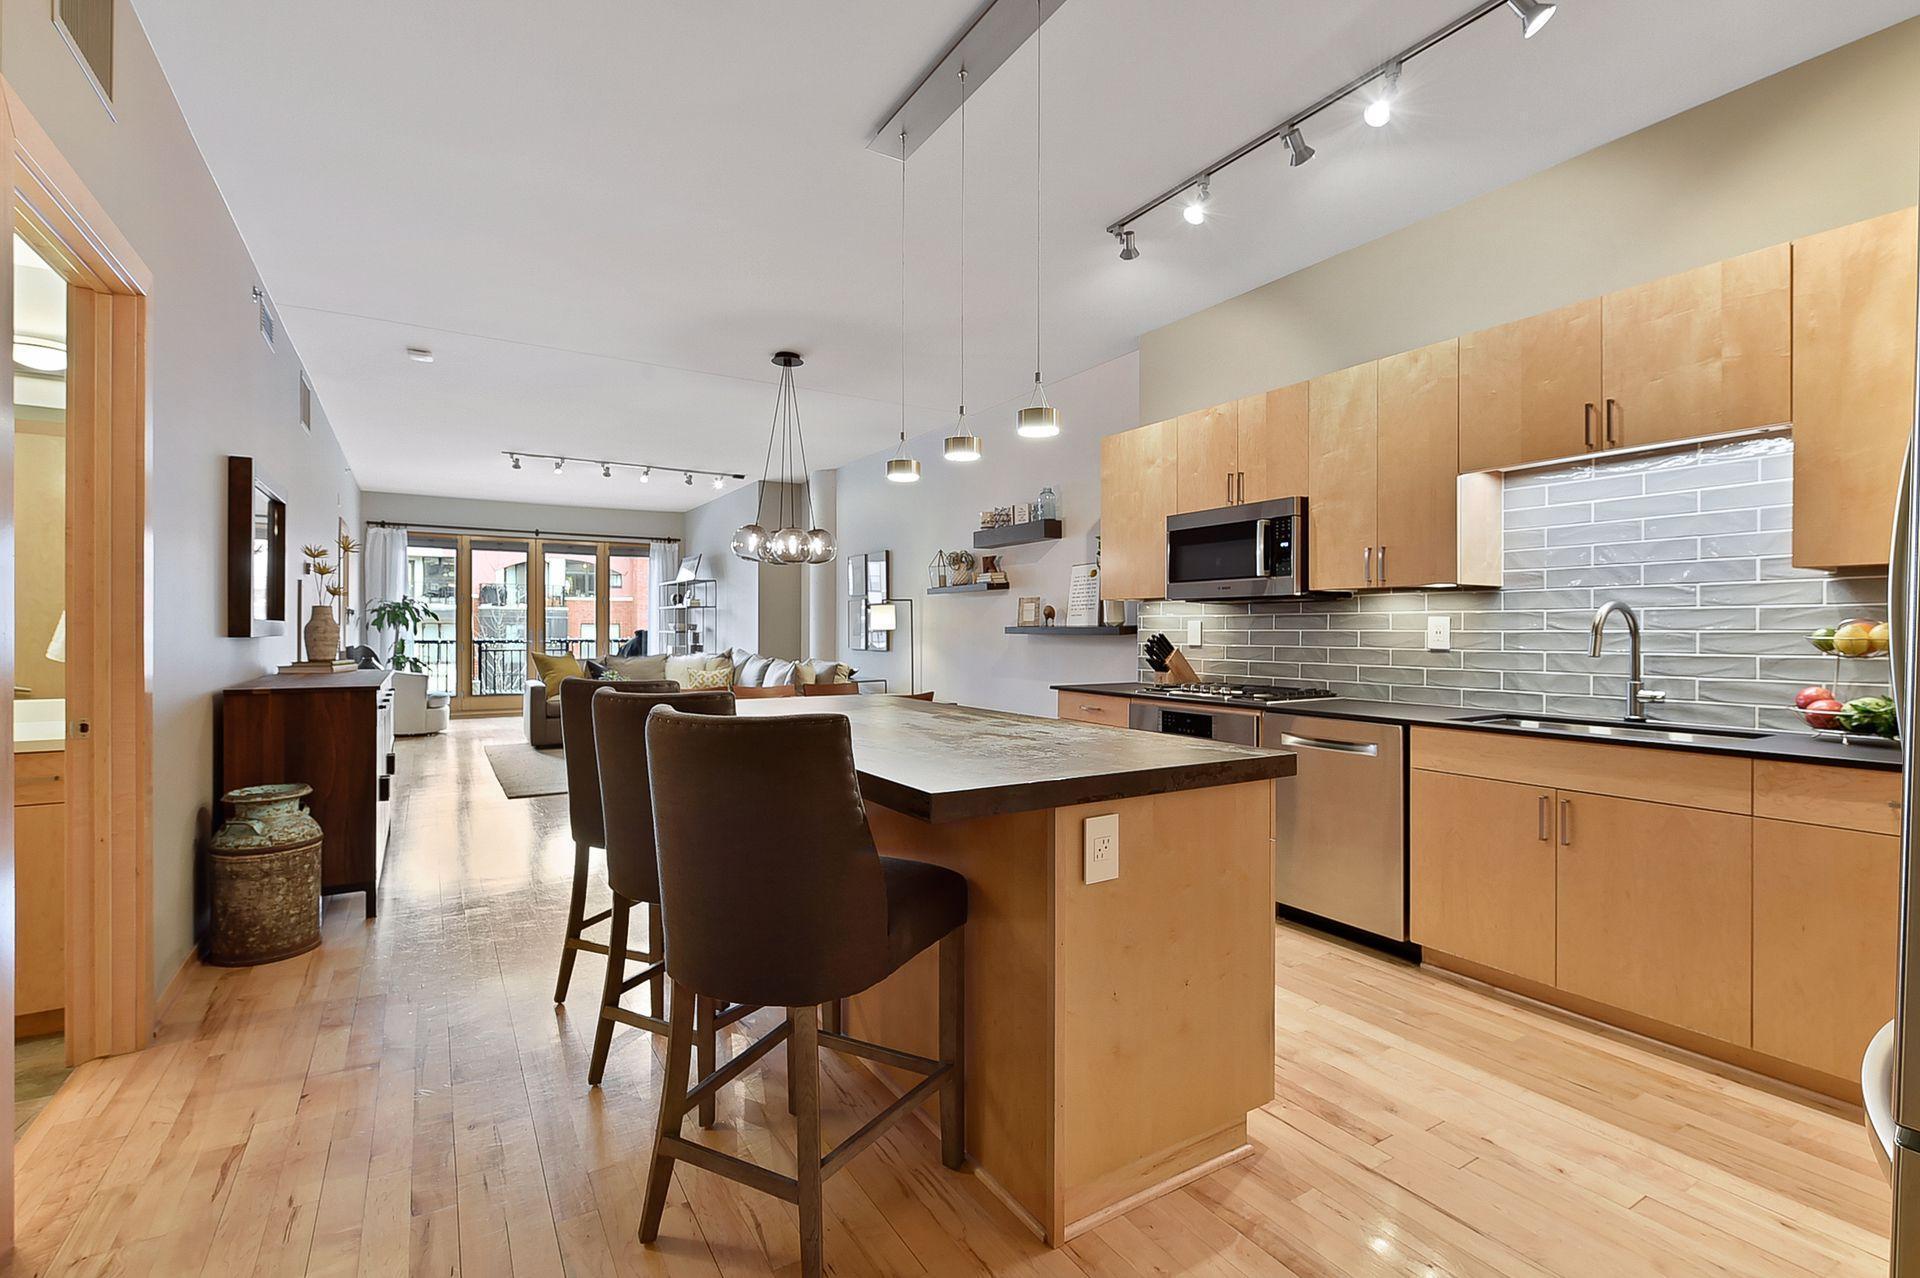 401 2nd Street, Minneapolis, Minnesota 55401, 2 Bedrooms Bedrooms, ,1 BathroomBathrooms,Residential Lease,For Sale,2nd,NST6112003